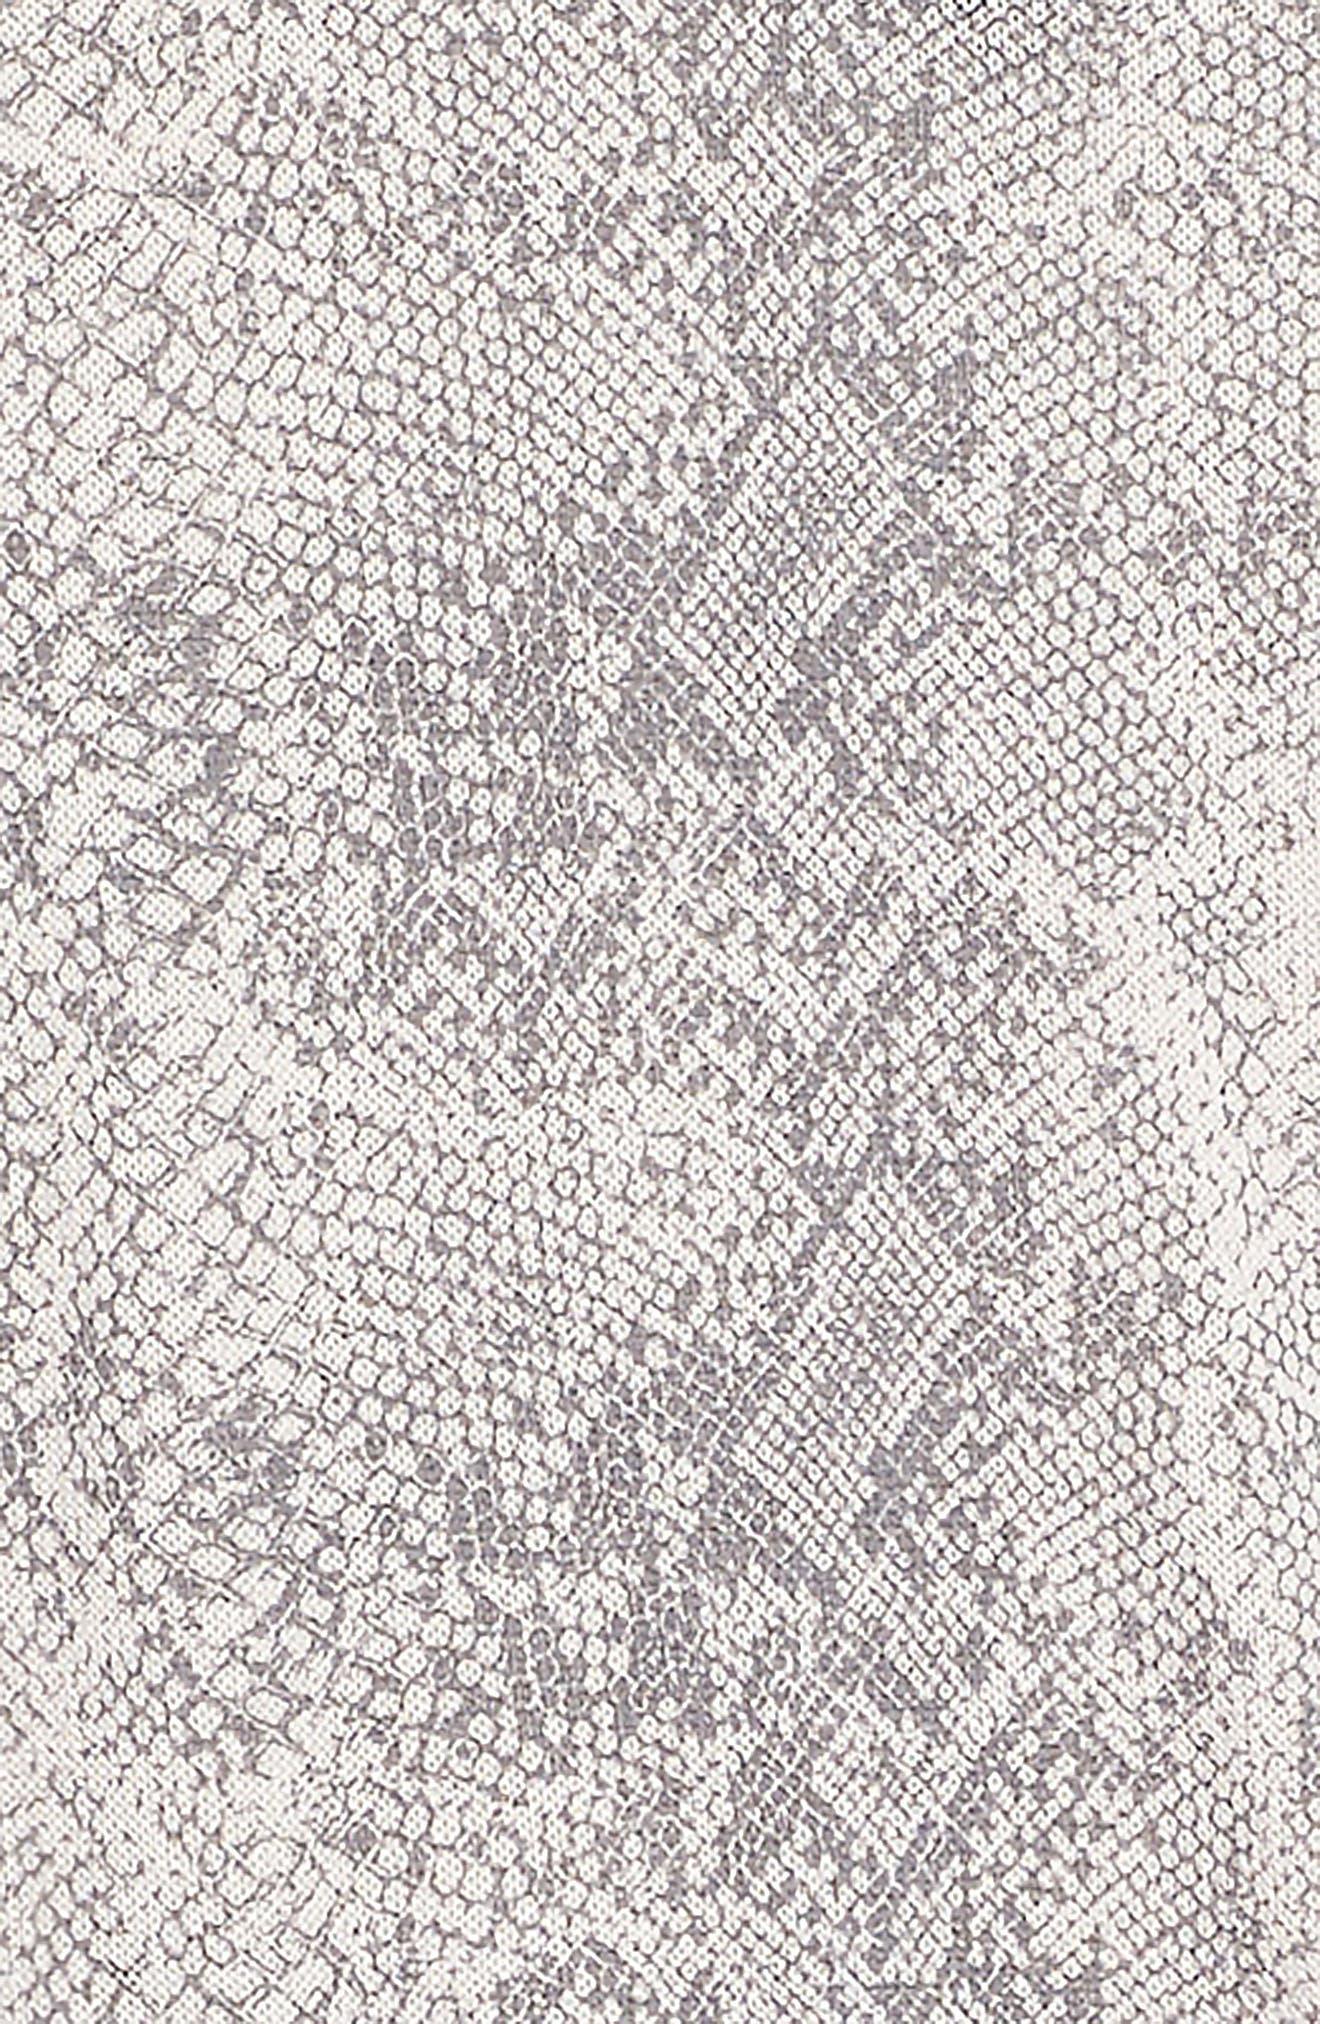 Alternate Image 3  - Splendid Python Print Loose Knit Dress (Big Girls)